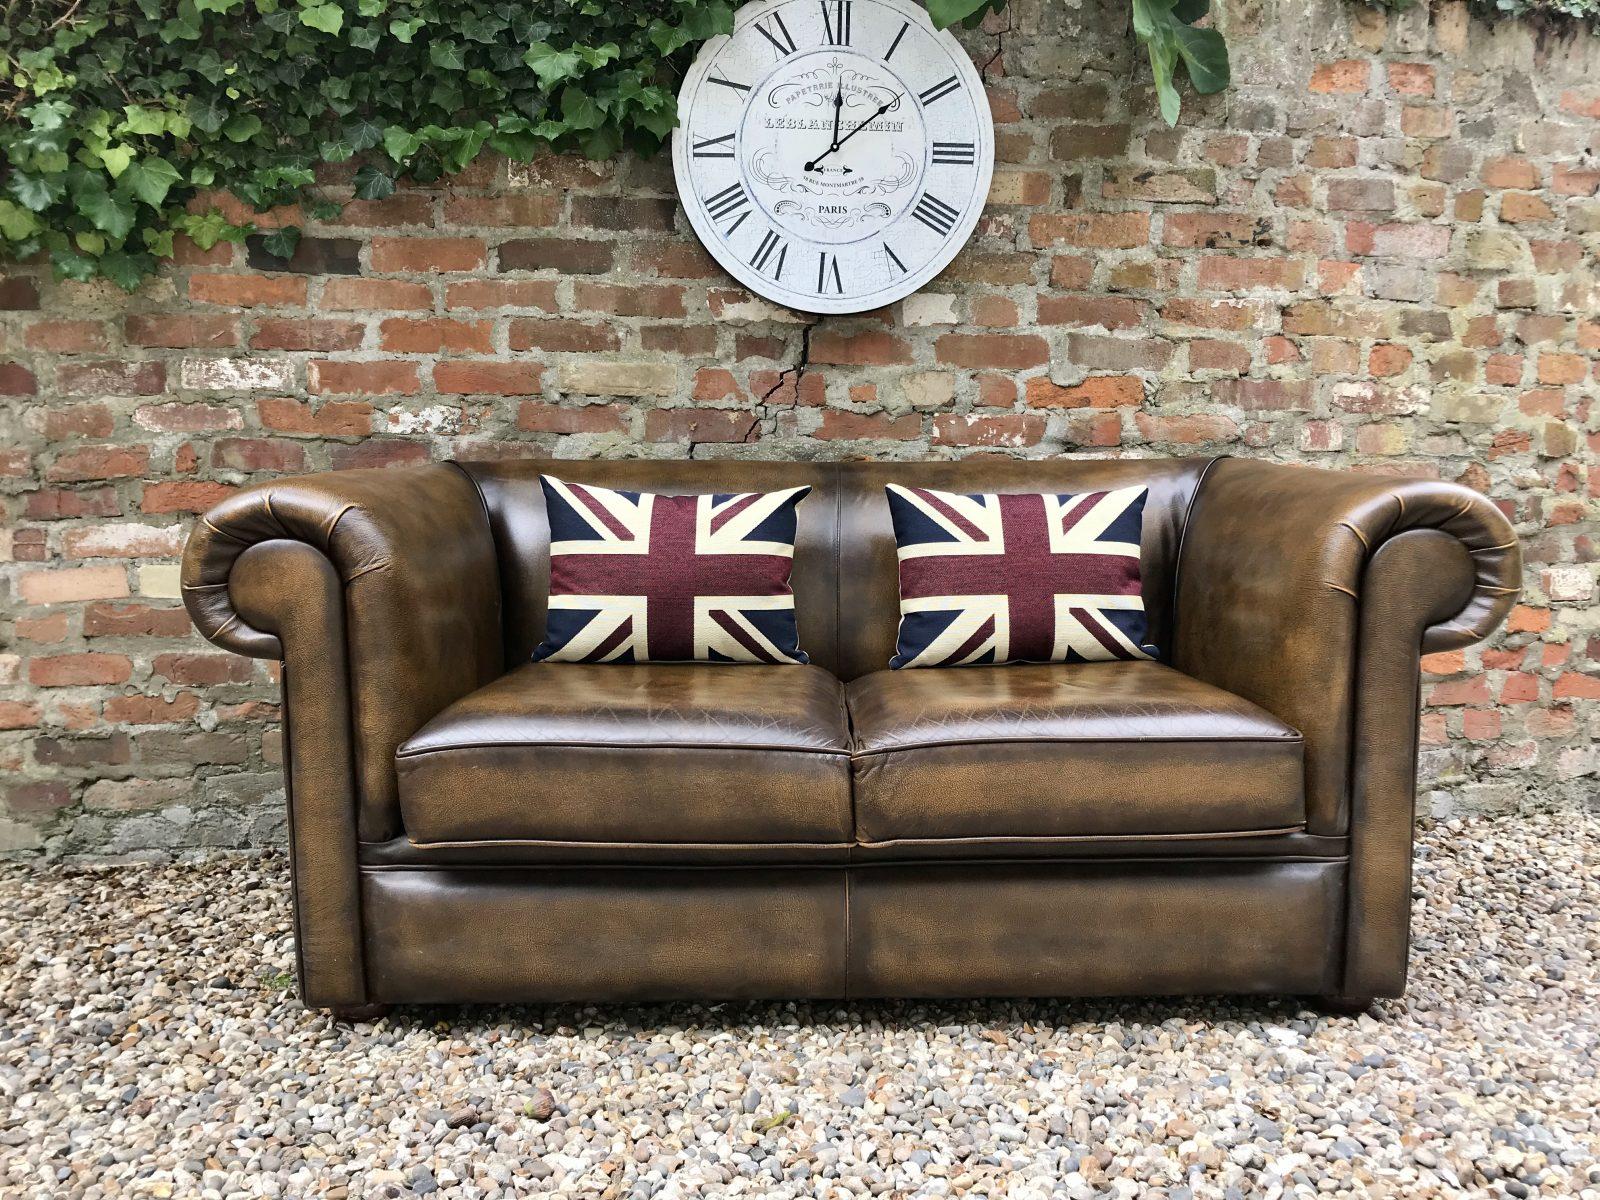 Stunning Antique Golden Brown Chesterfield Sofa.